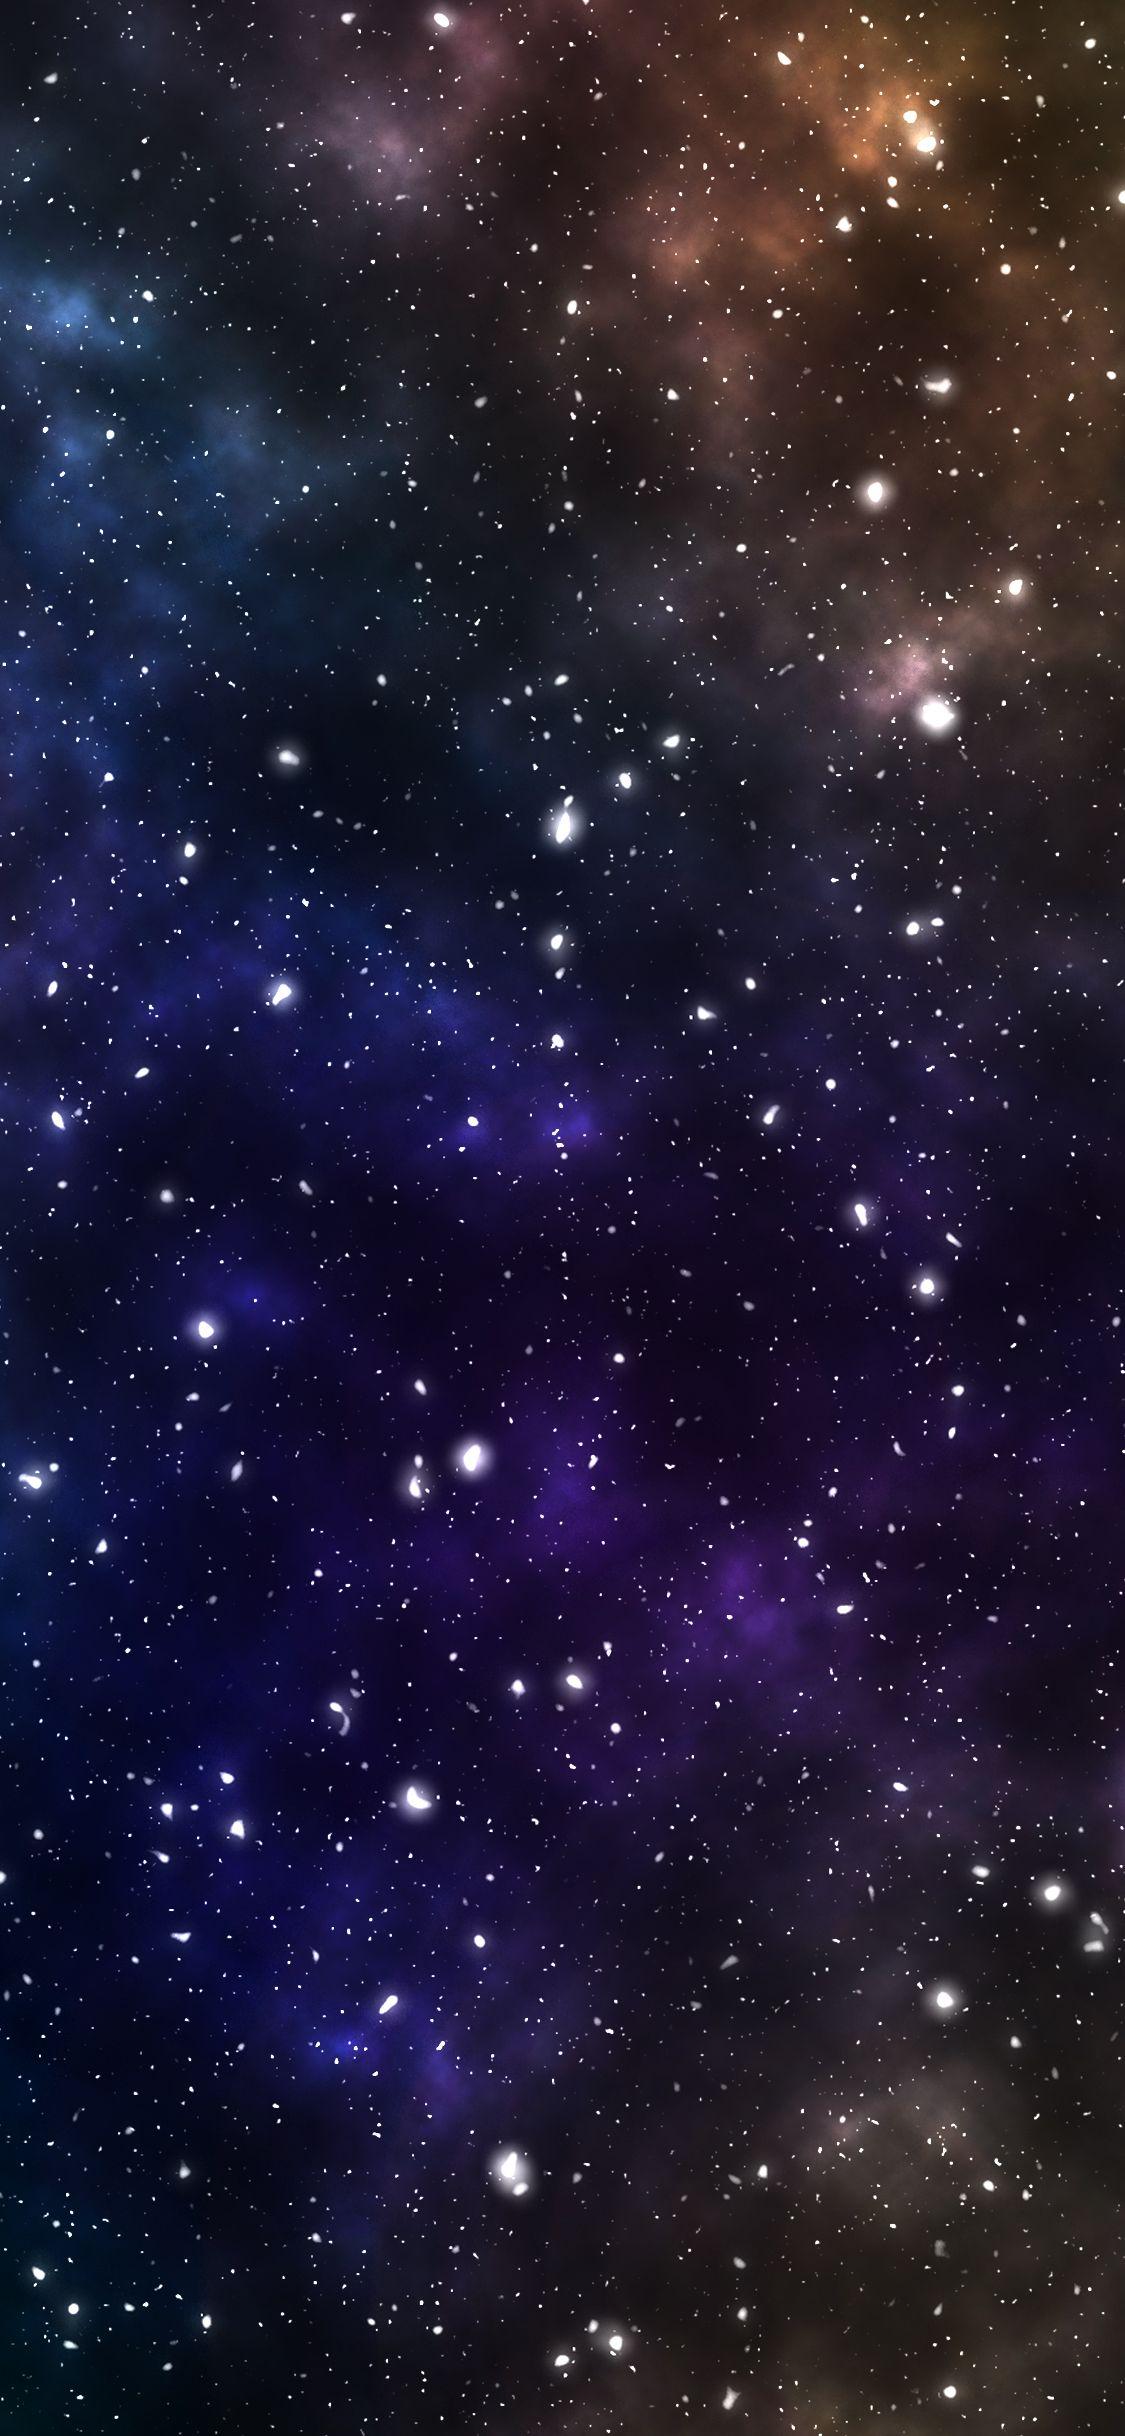 Best Galaxy Wallpaper Hd Galaxy Wallpaper Iphone Wallpaper Amazing Hd Wallpapers